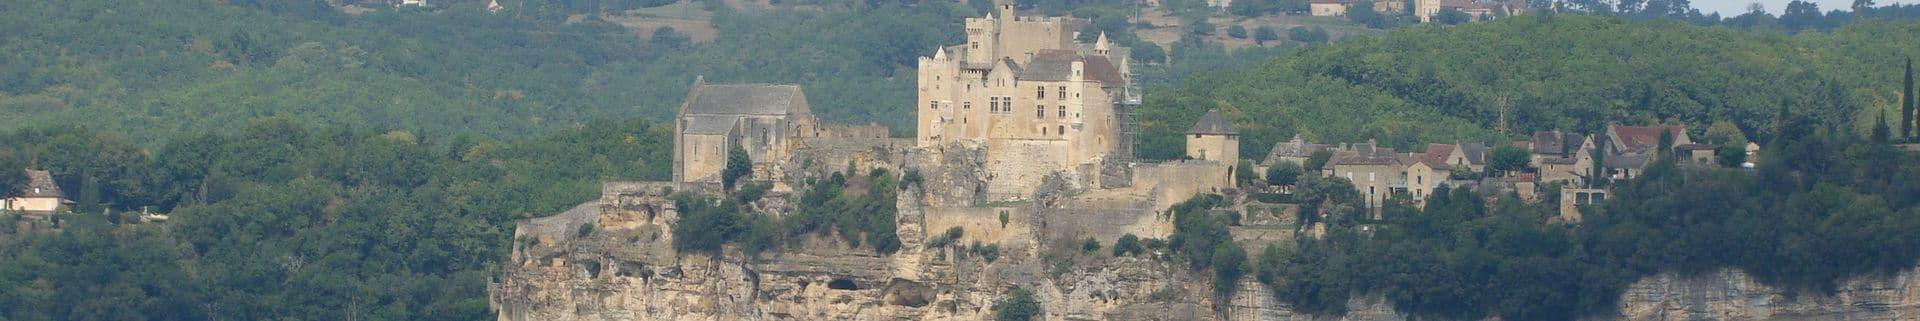 Vallée de la Dordogne - Beynac